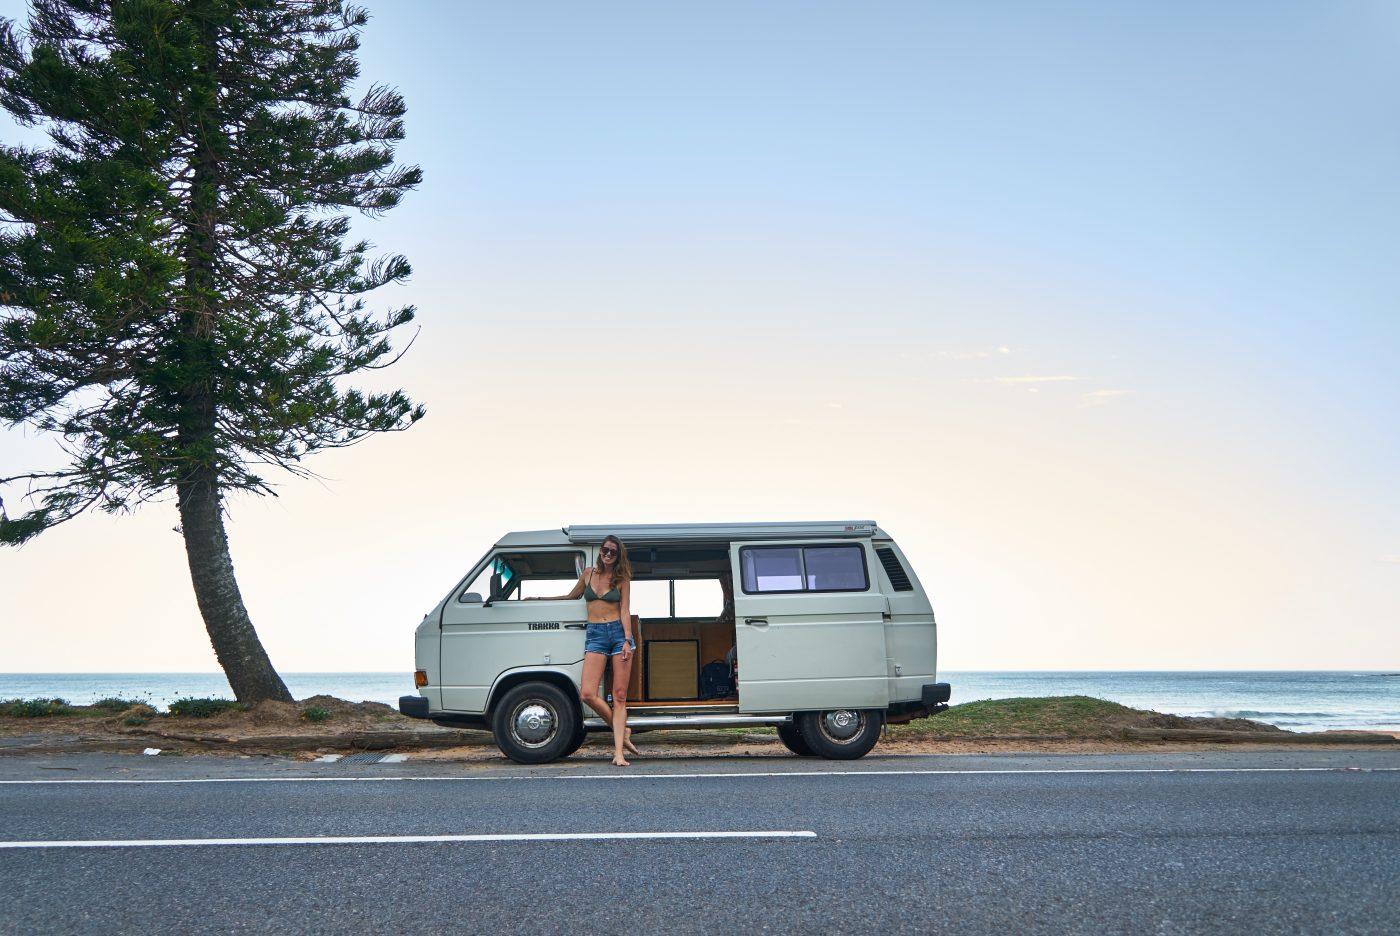 Minimalism: Mobile Home